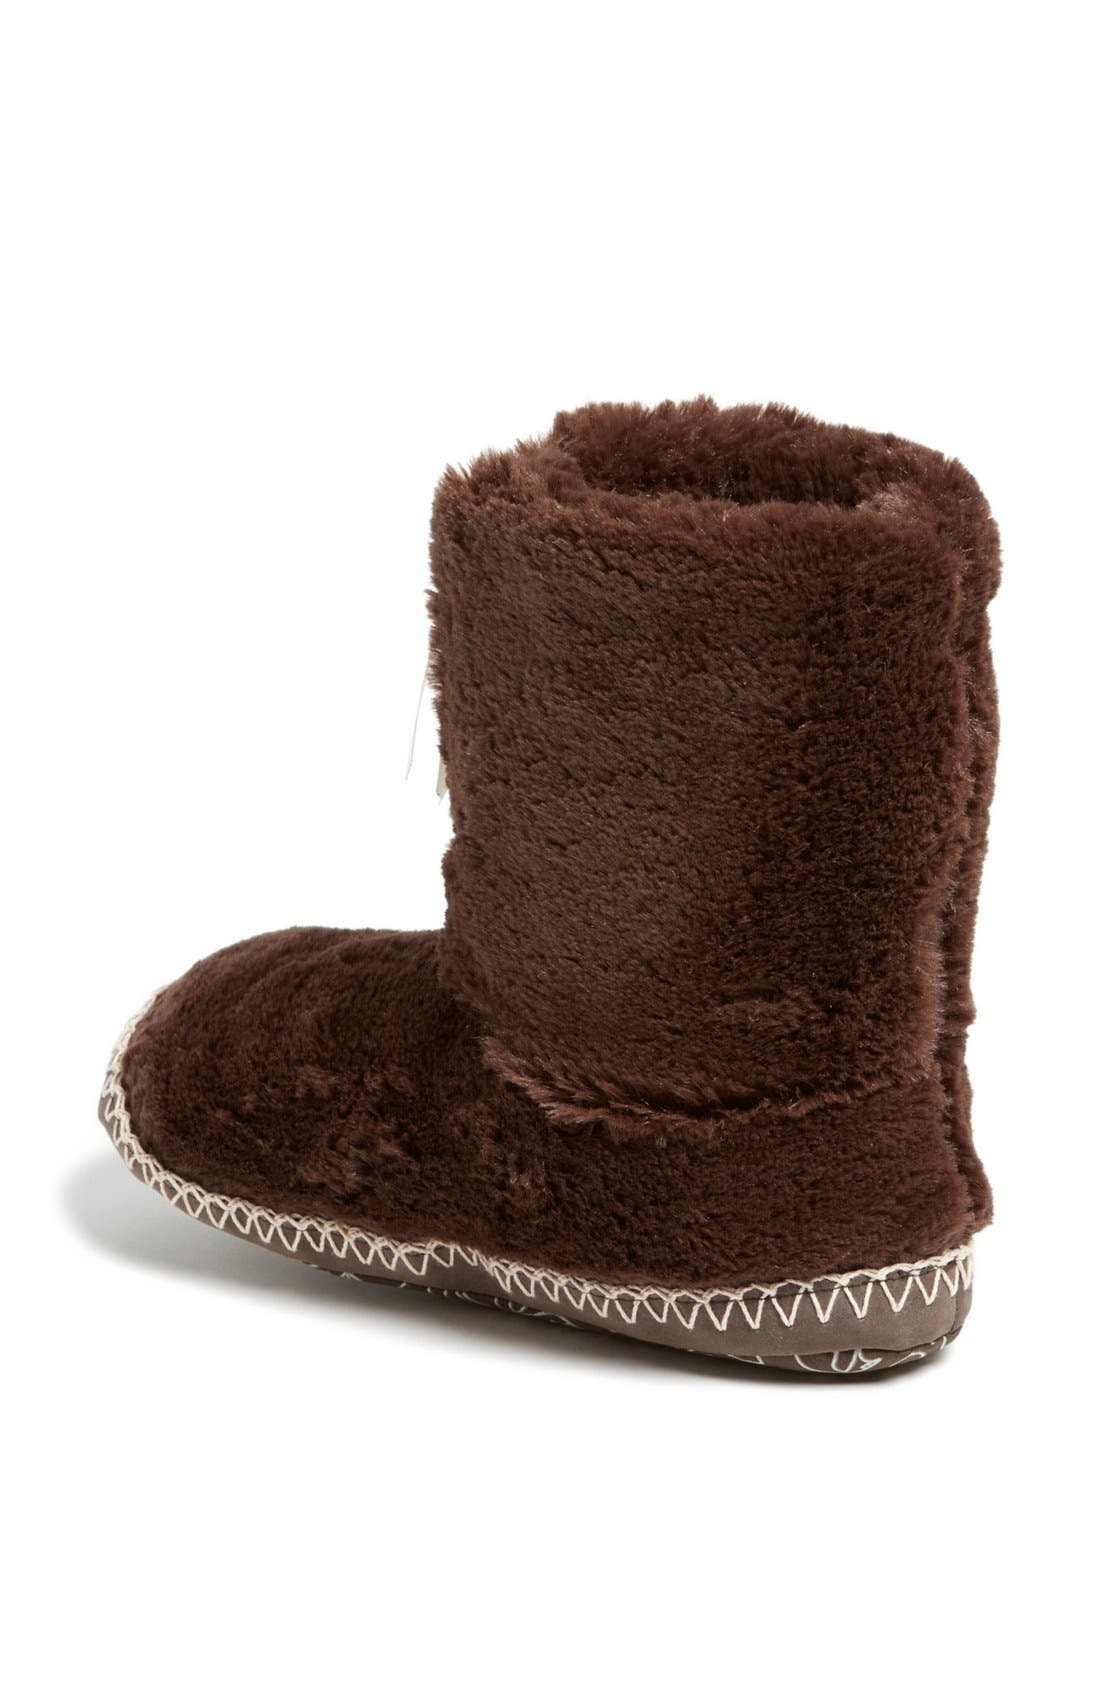 Alternate Image 2  - Bedroom Athletics 'Marilyn' Faux Fur Bootie Slipper